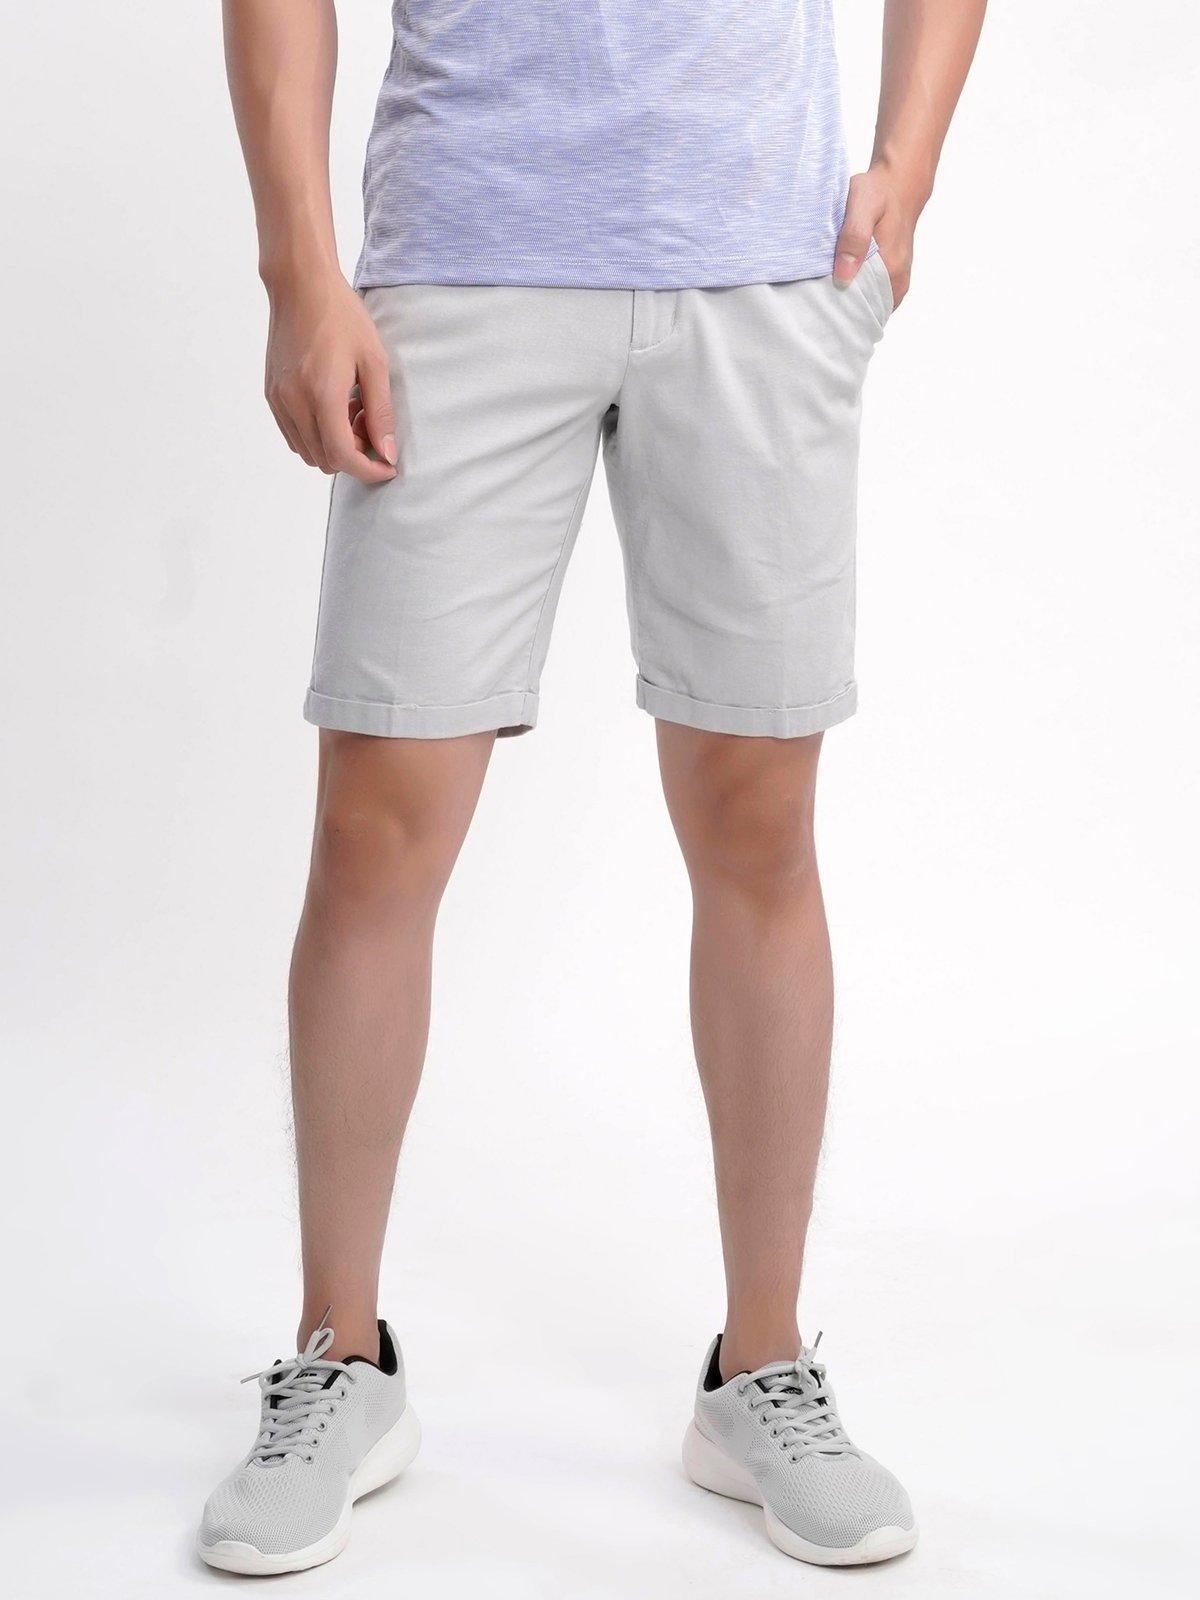 Quần short nam Aristino ASO020S7